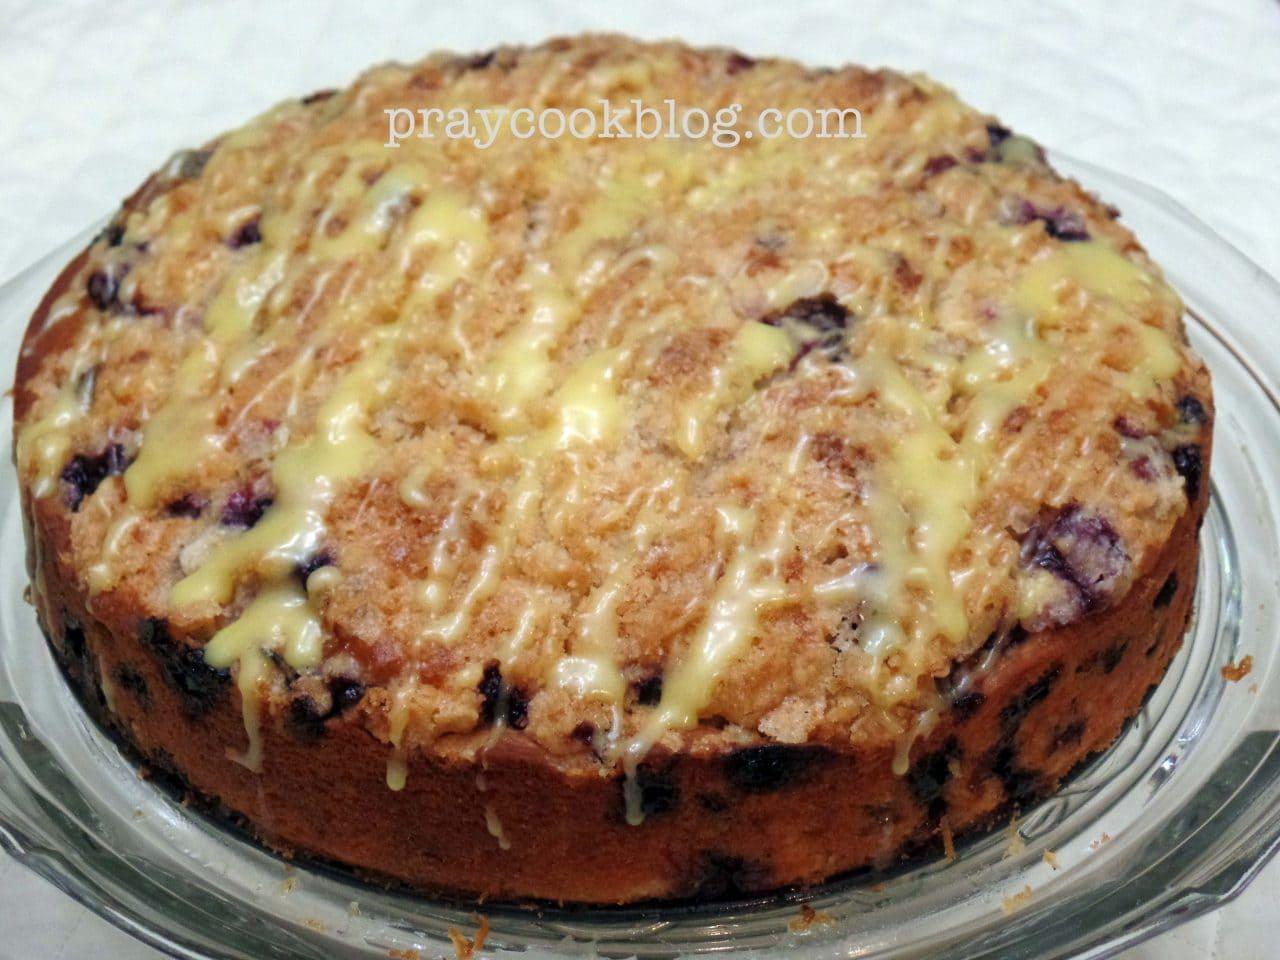 Lemon Blueberry Coffee Cake – Got Blueberries?